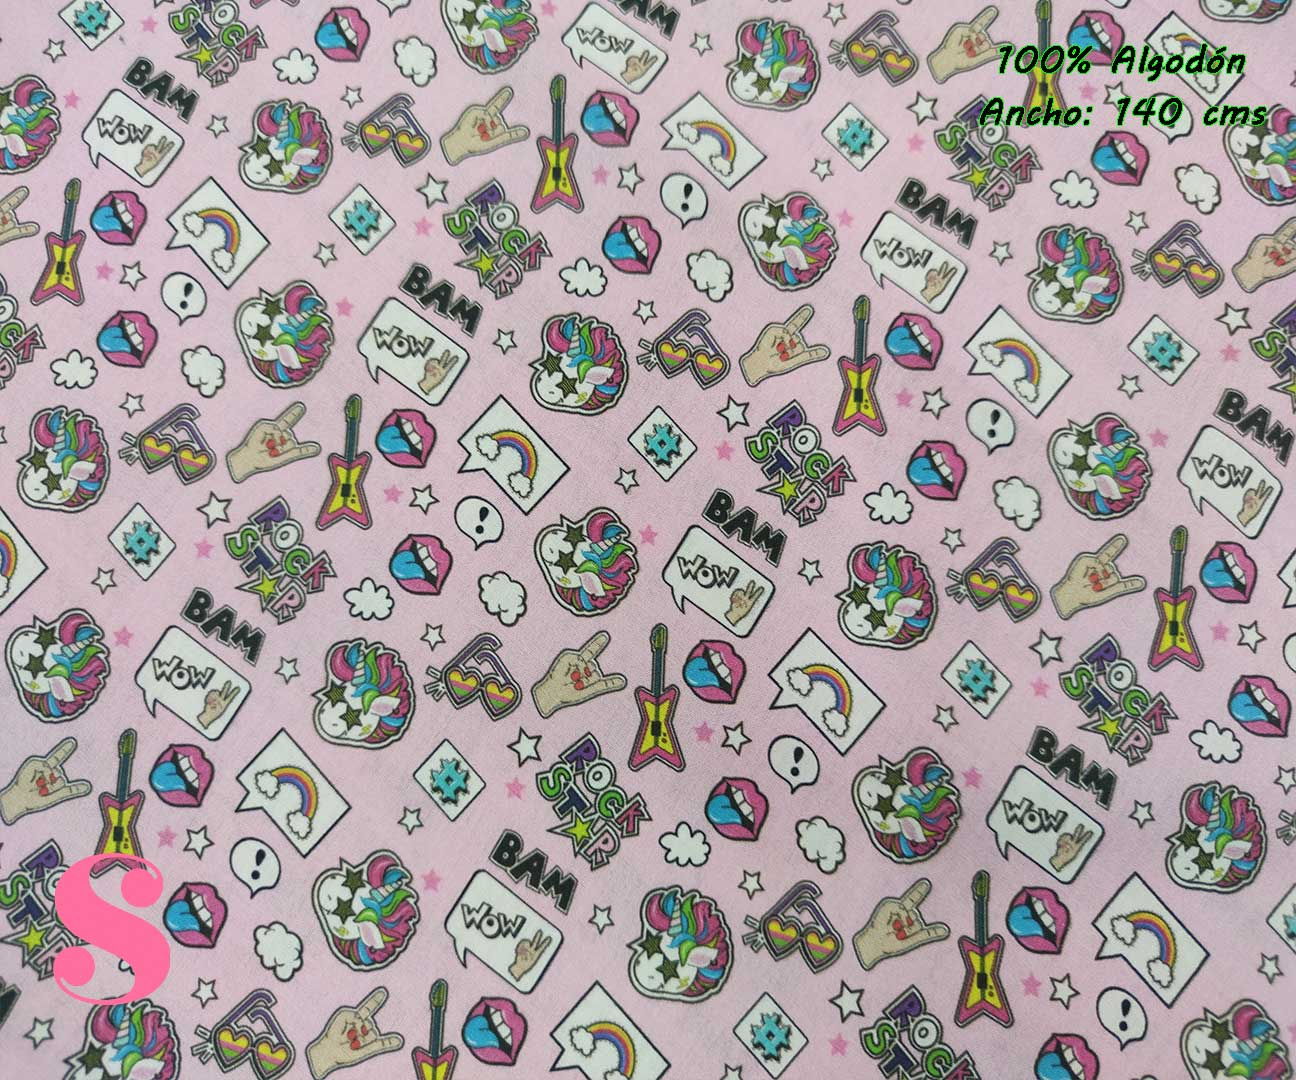 16-telas-frikis,tejidos-estampados,estampados-unicornios,telas-originales,camelot-fabrics,Tejido Estampado Rock Unicorn